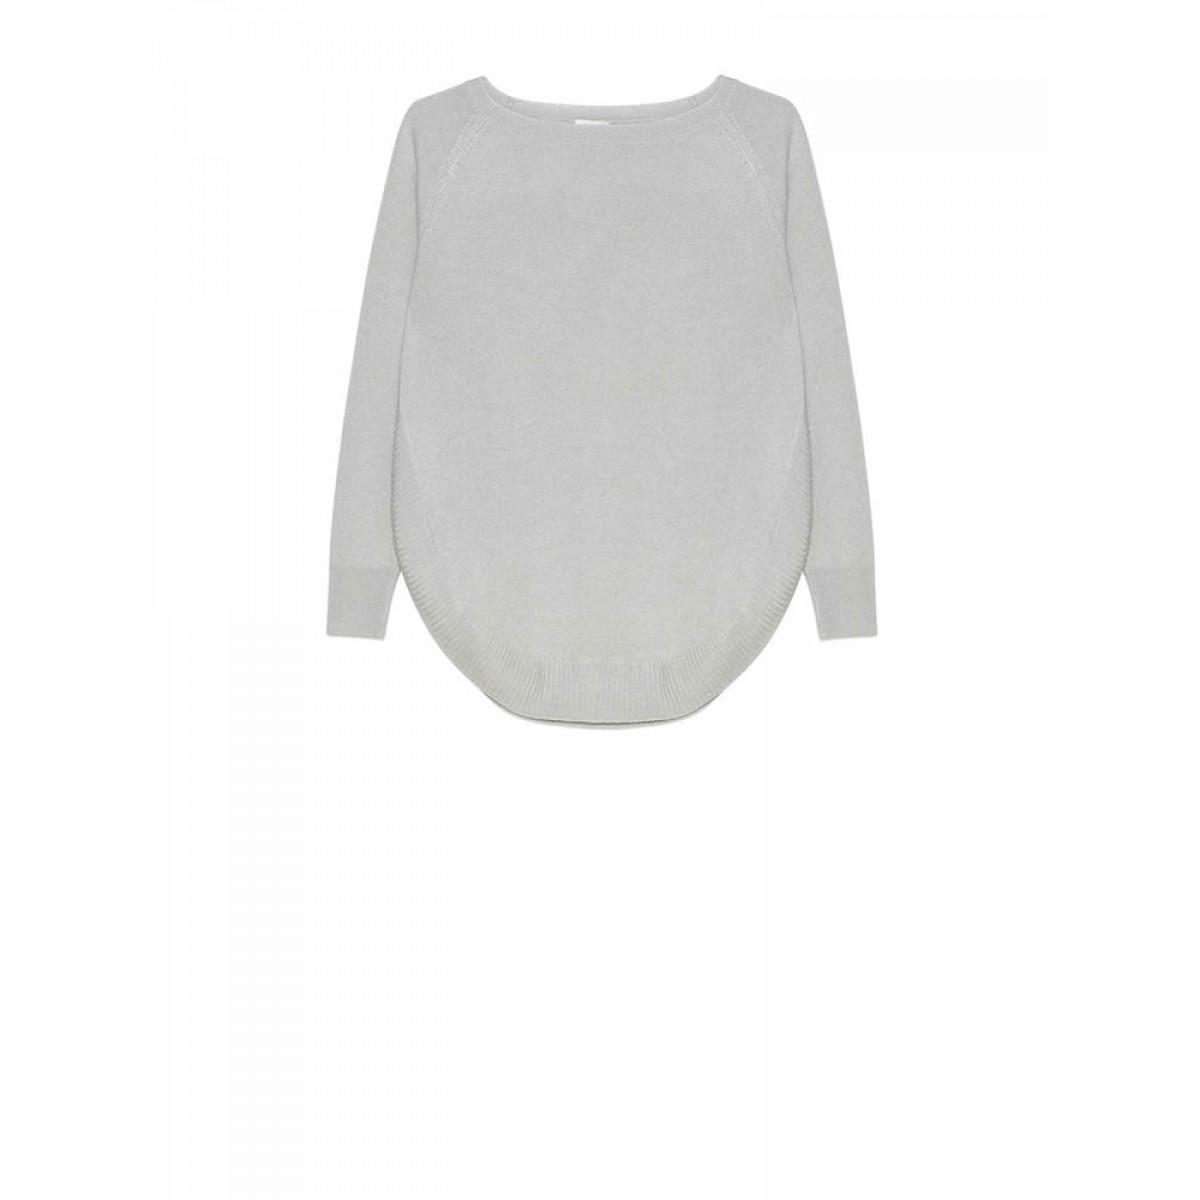 8e6cf1fd401a Fashion 100% Wool Sweater Design For Girl